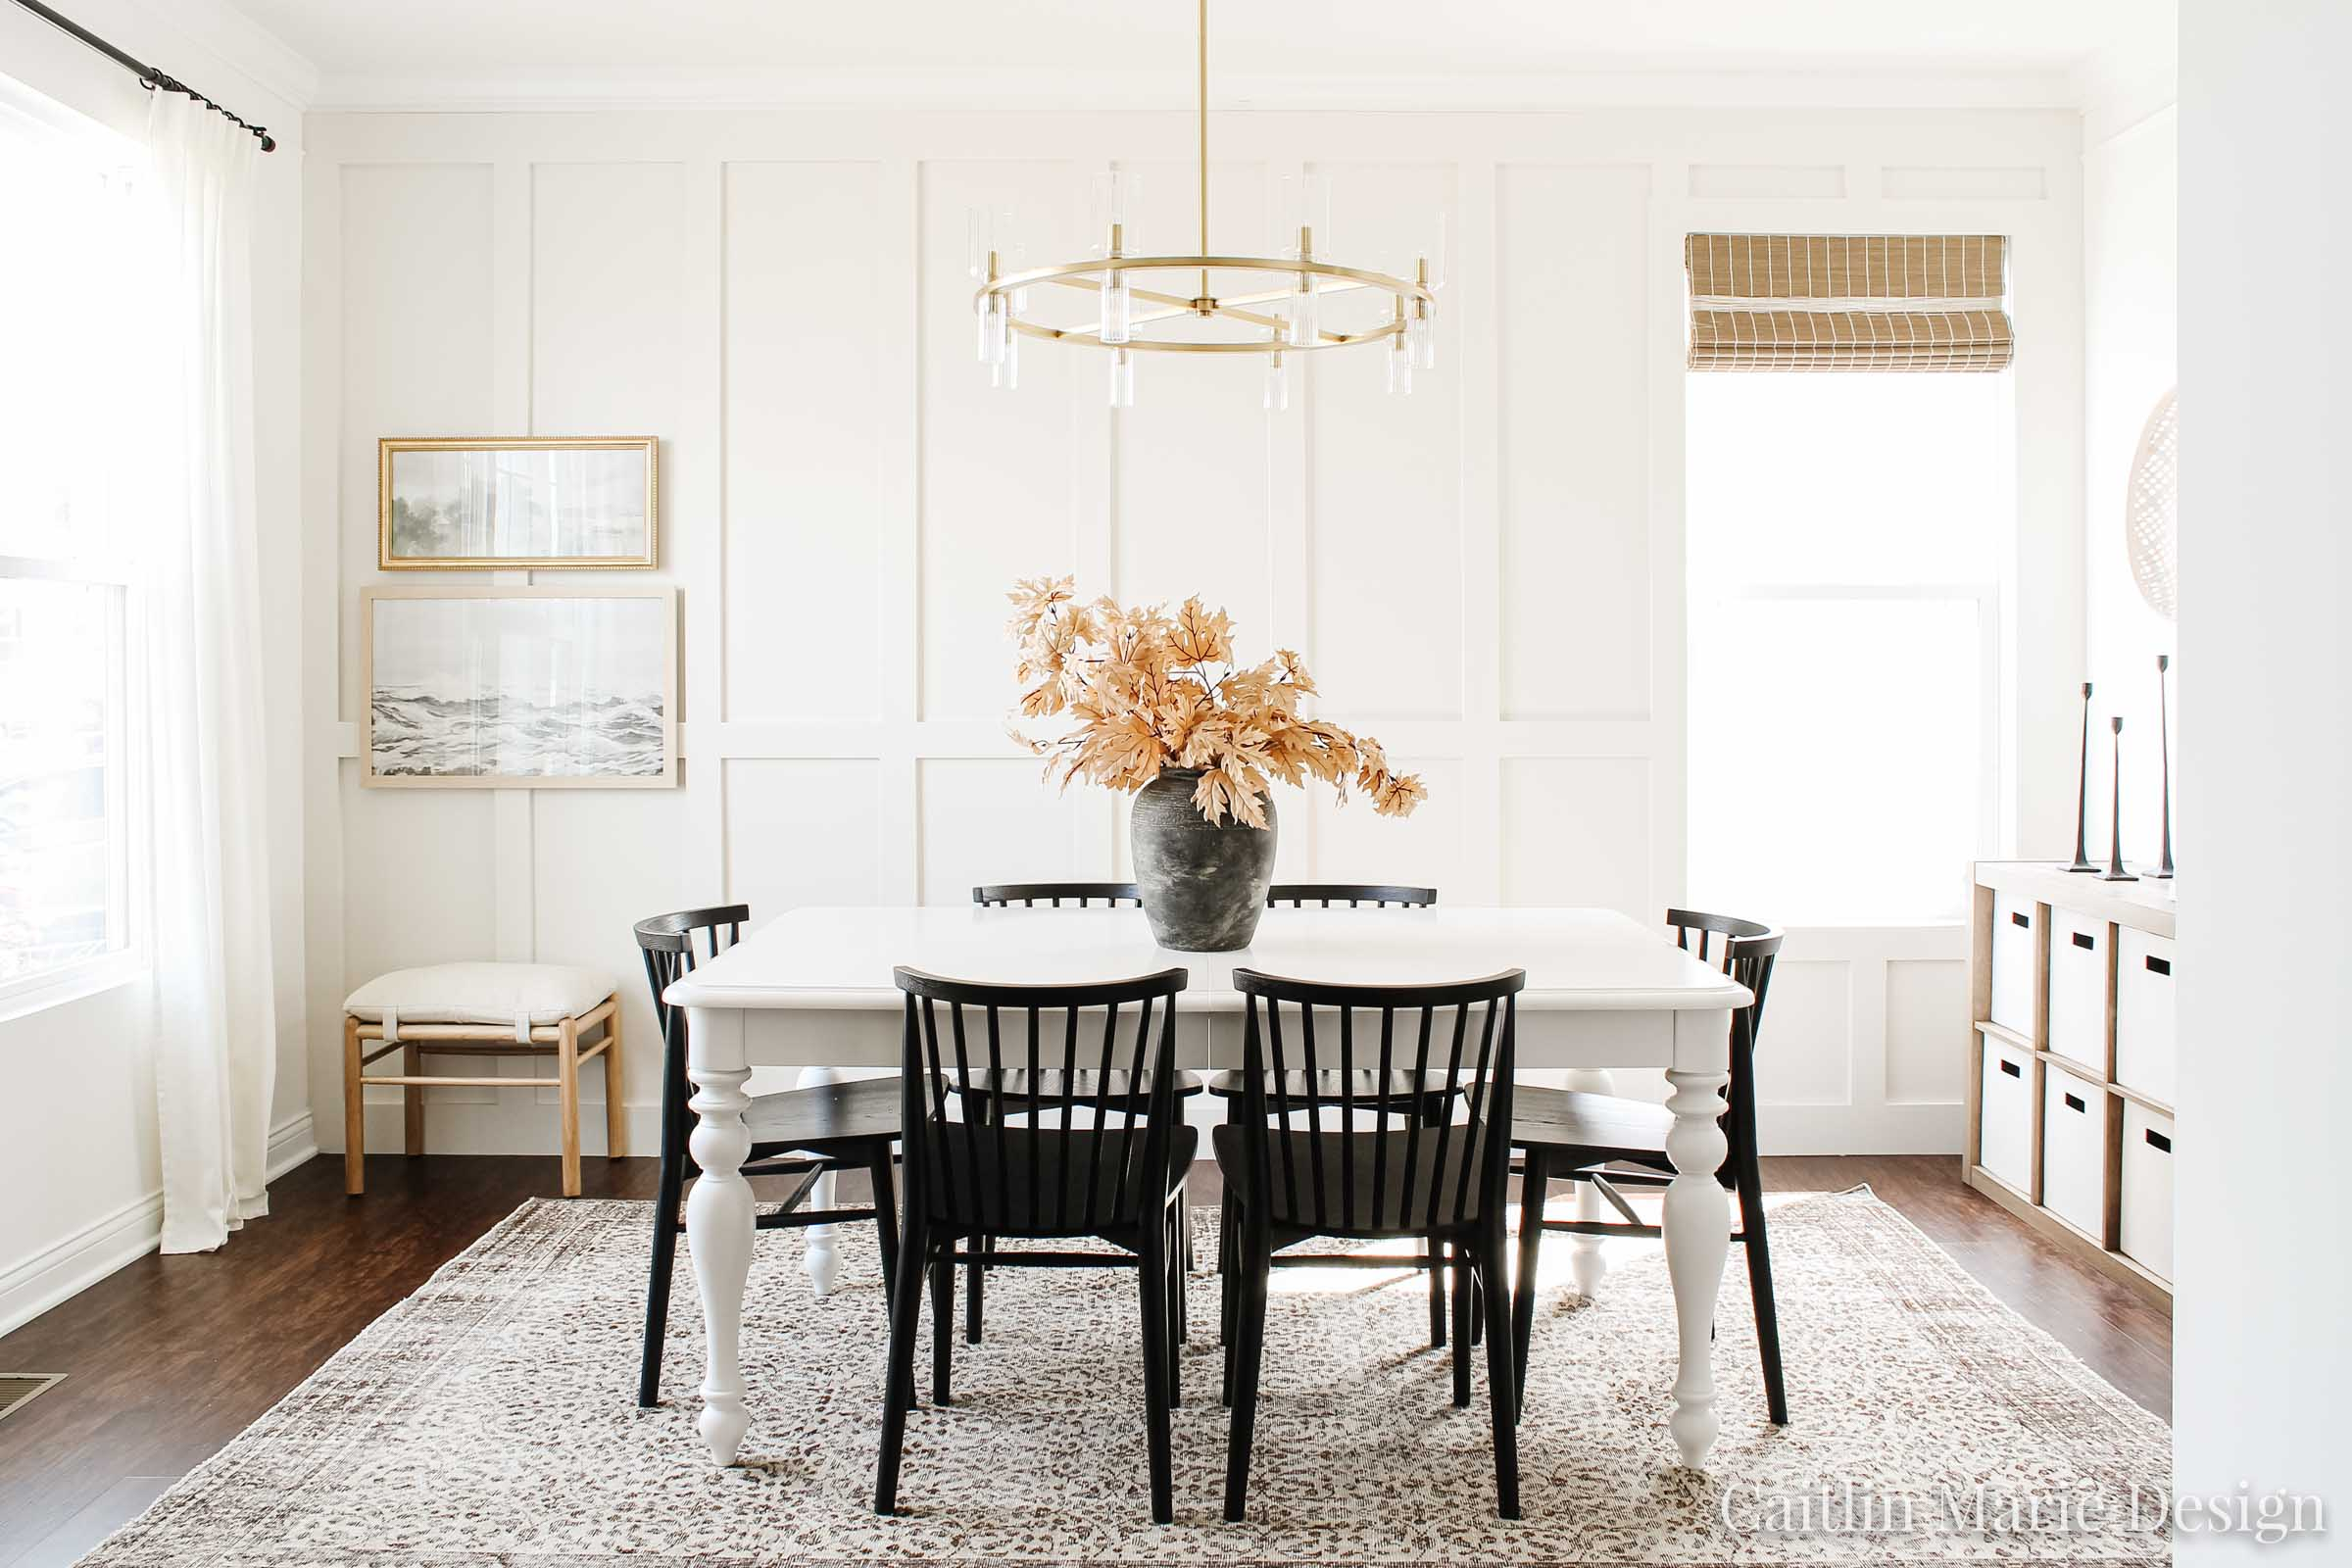 Minimalist Fall Decor | Fall Home Tour 2020 | coastal modern decor, vintage home, Article dining chairs, aged stone vase, board and batten, coastal farmhouse